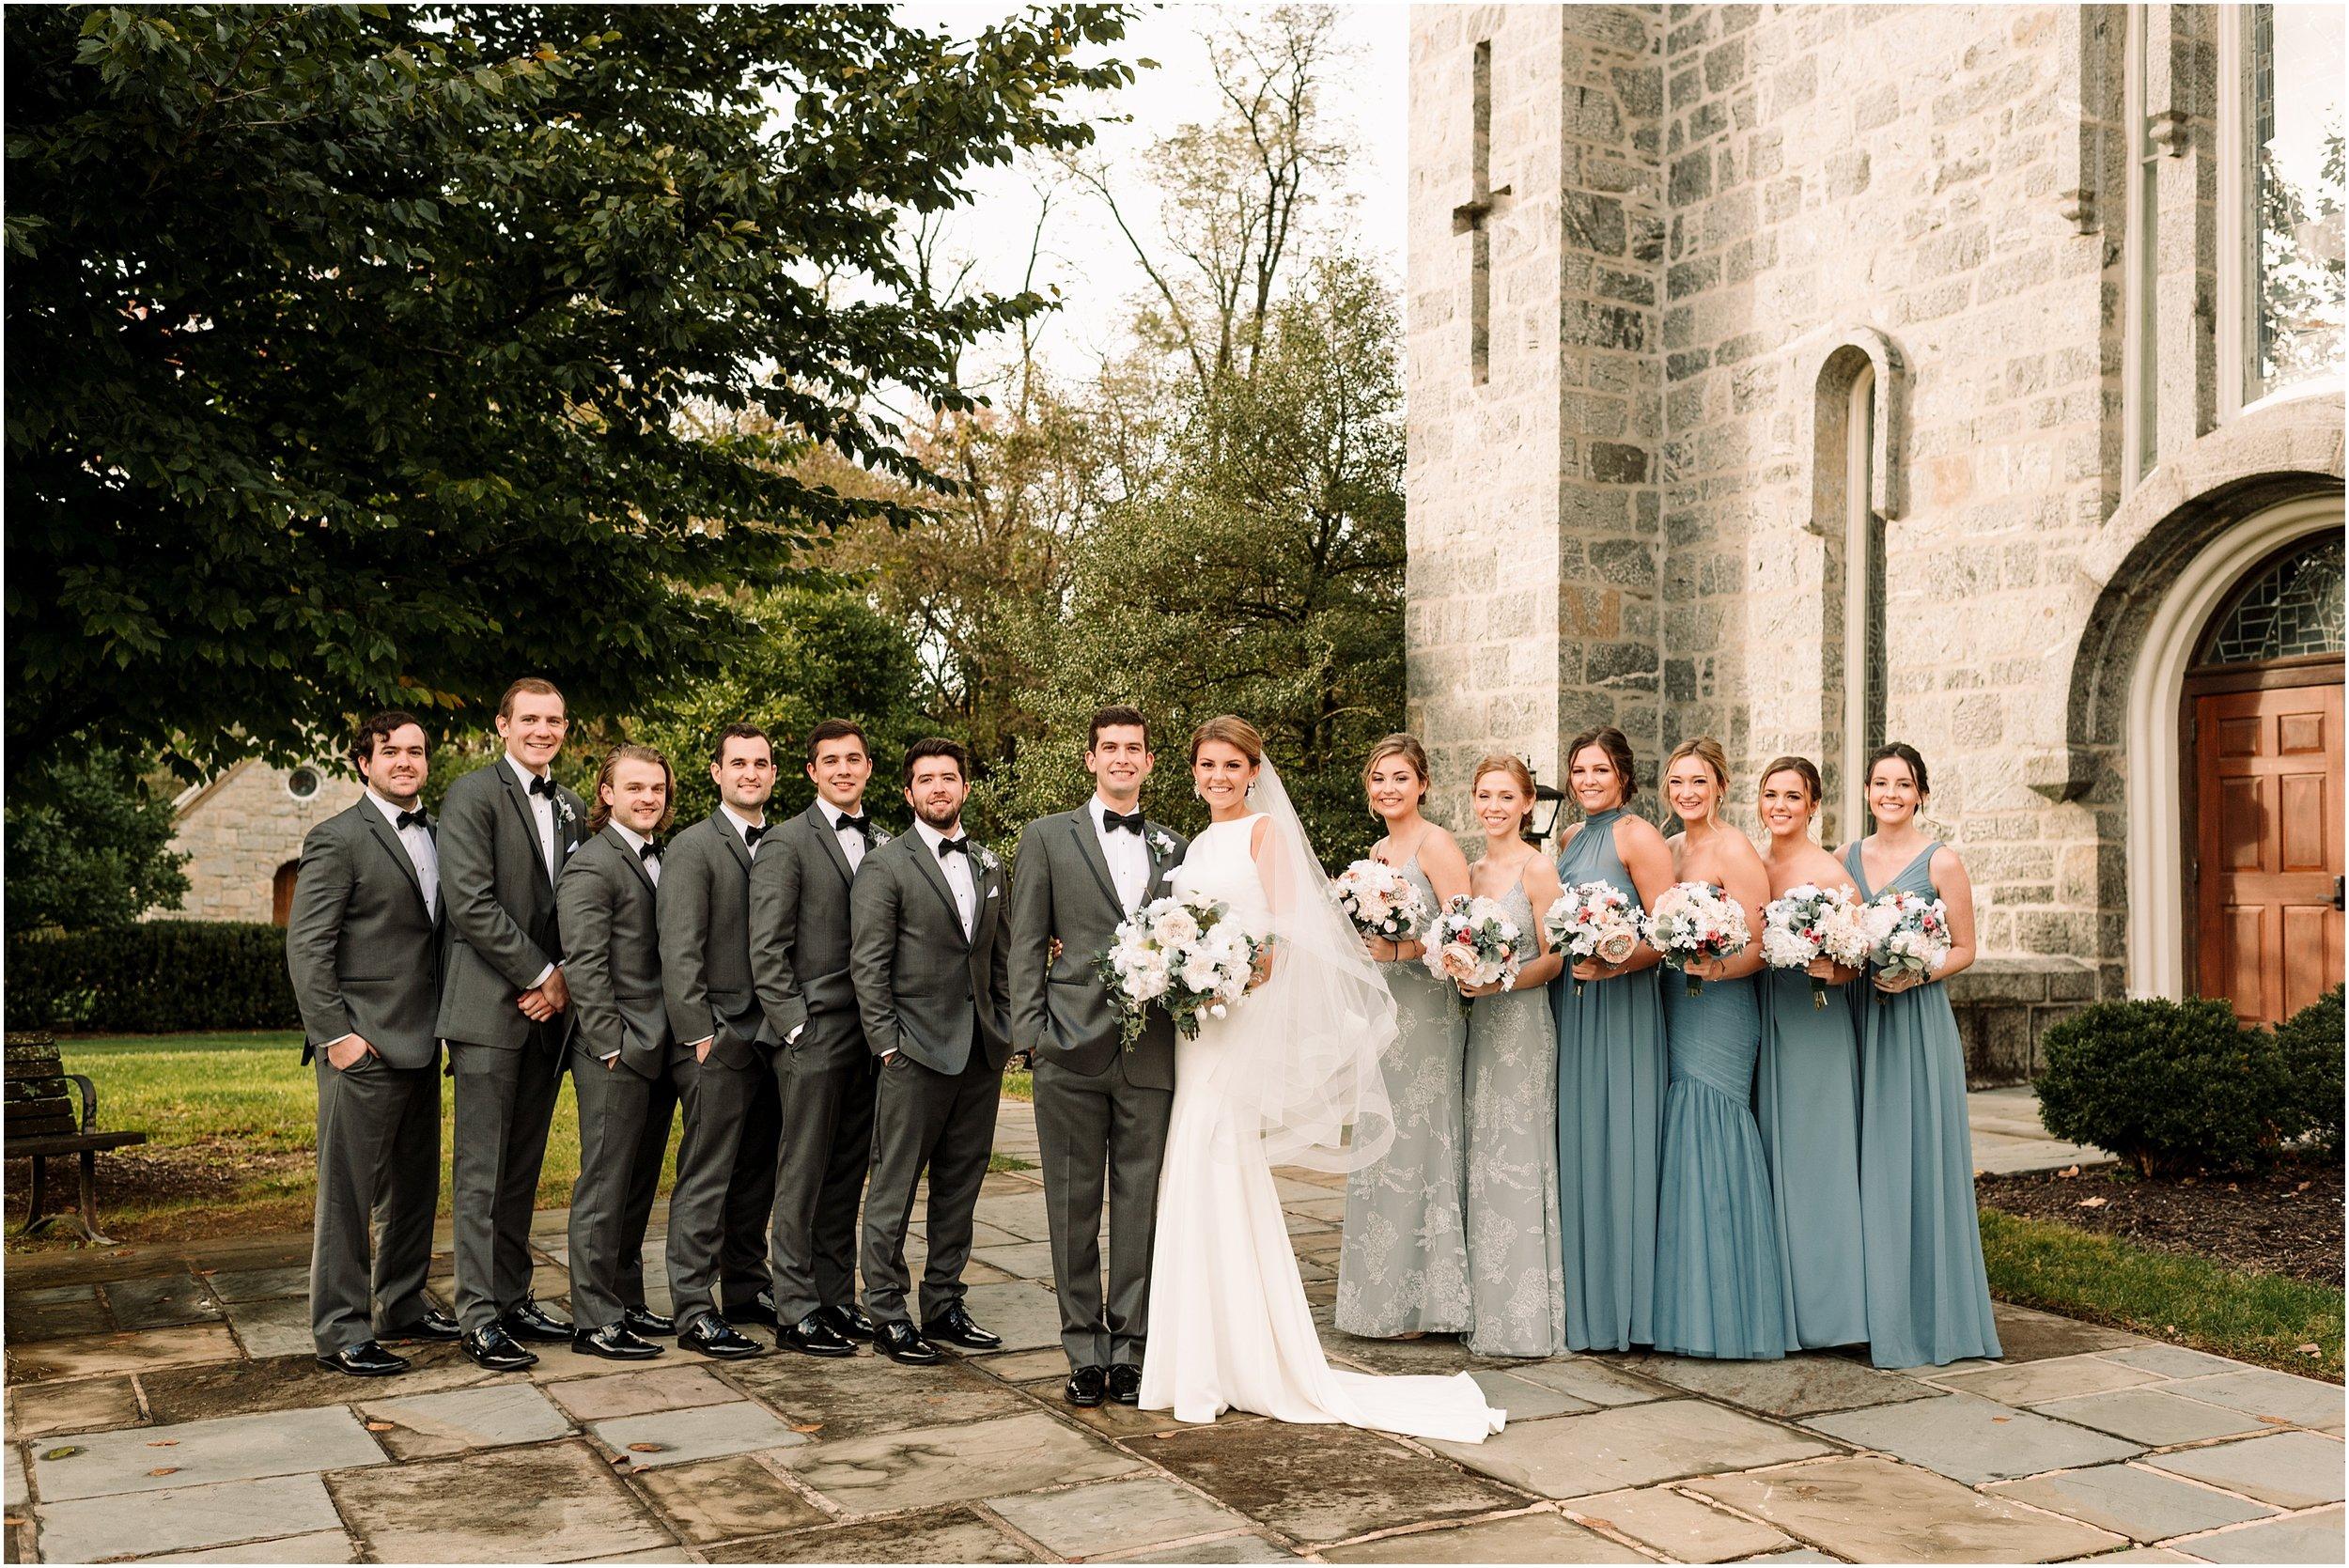 hannah leigh photography ellicott city church wedding baltimore md_2107.jpg